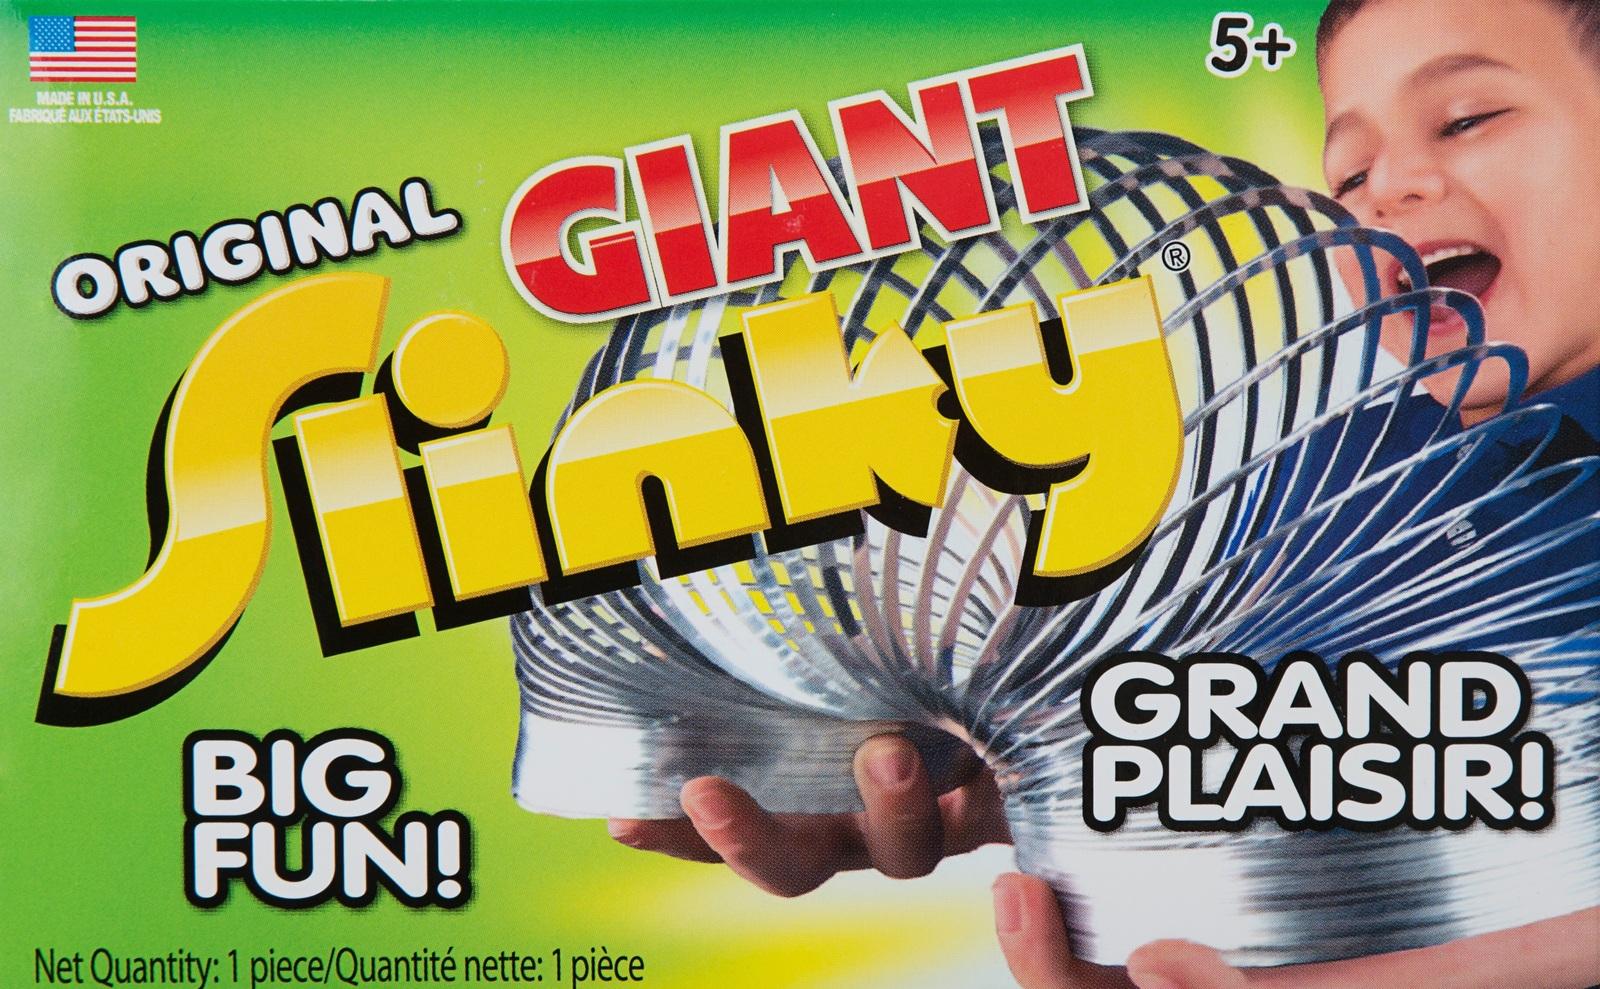 Slinky: Original Giant Slinky image